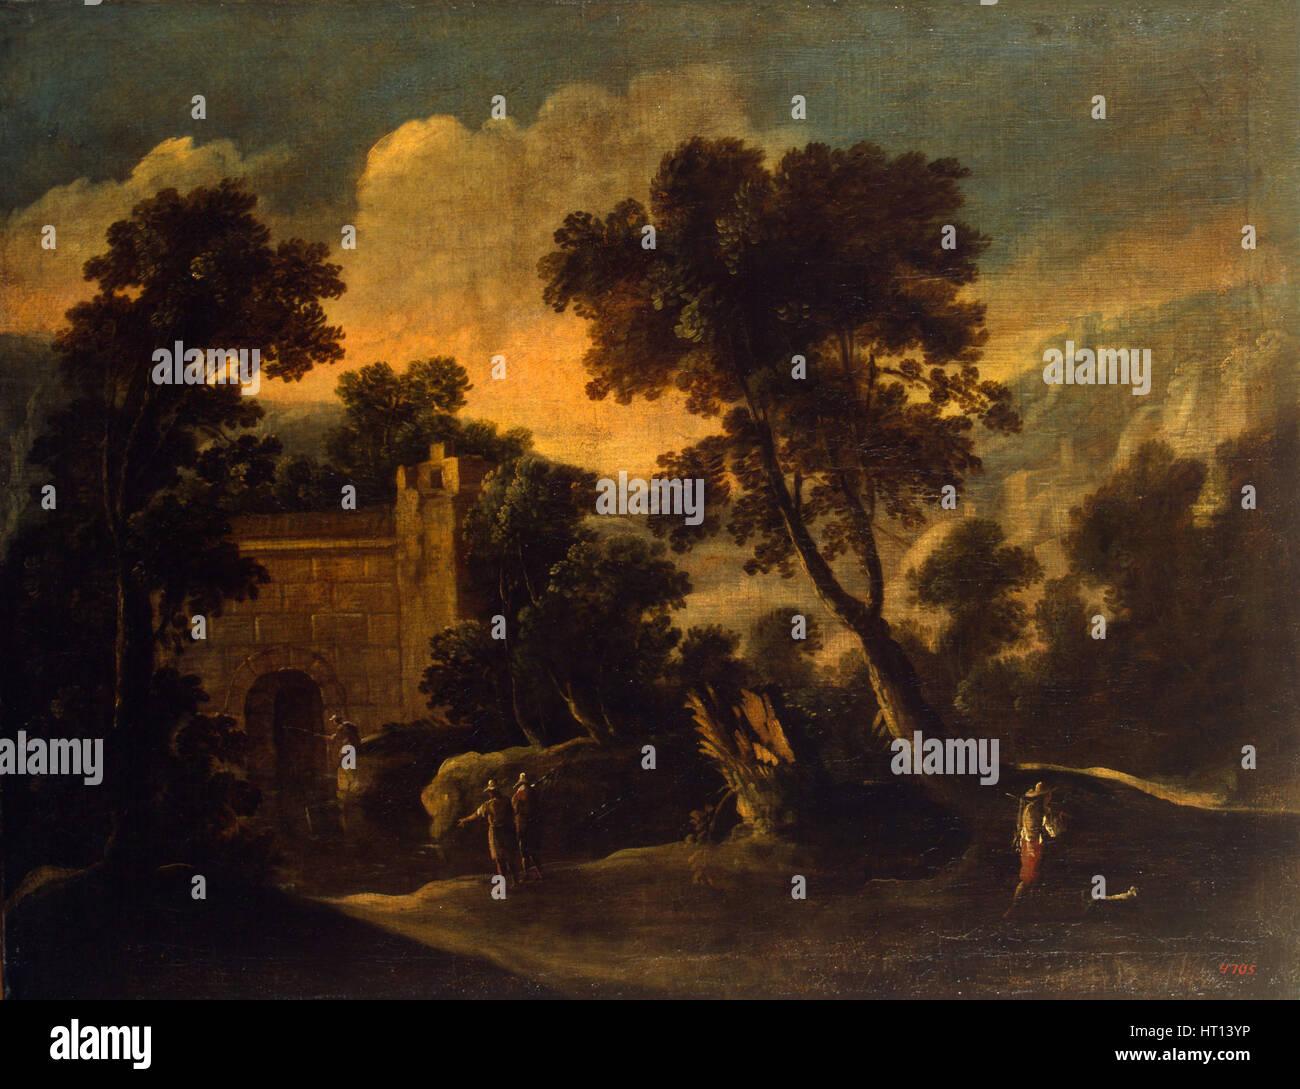 Landscape with Ruins, ca 1634. Artist: Collantes, Francisco (1599-1656) - Stock Image